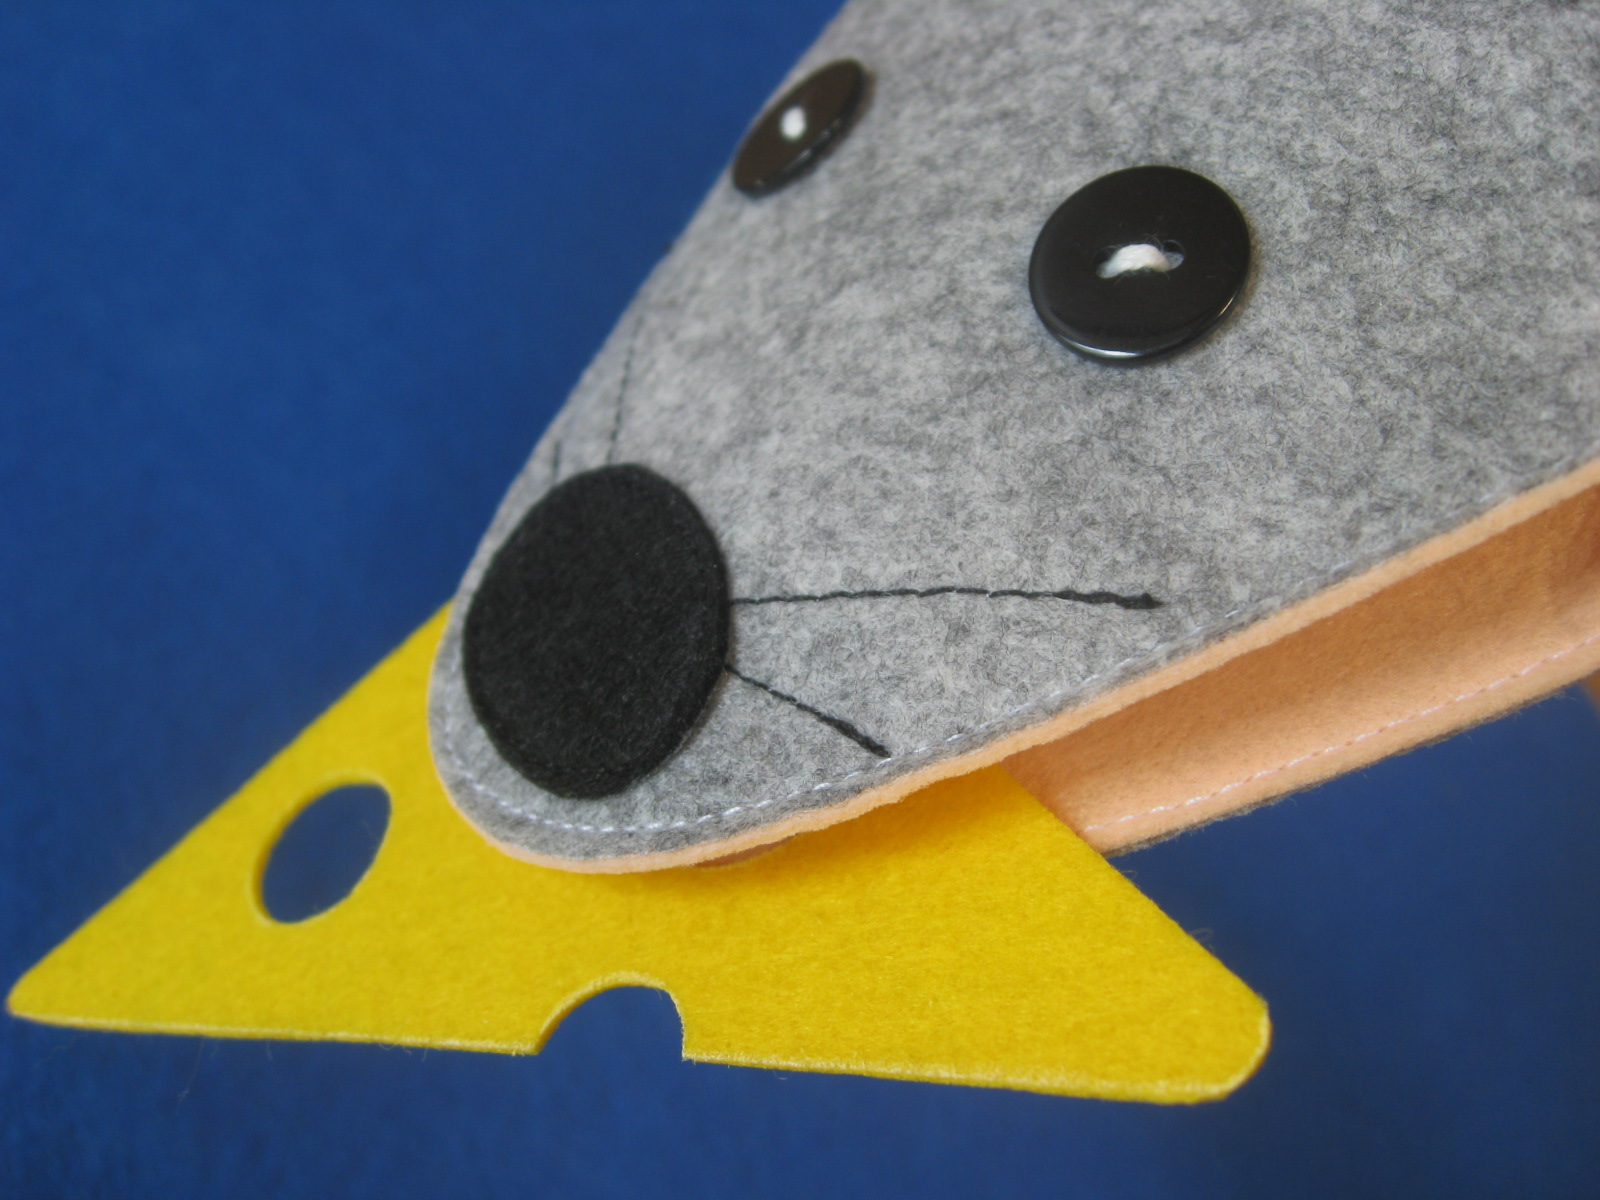 выкройка игрушки из фетра на руку мышка